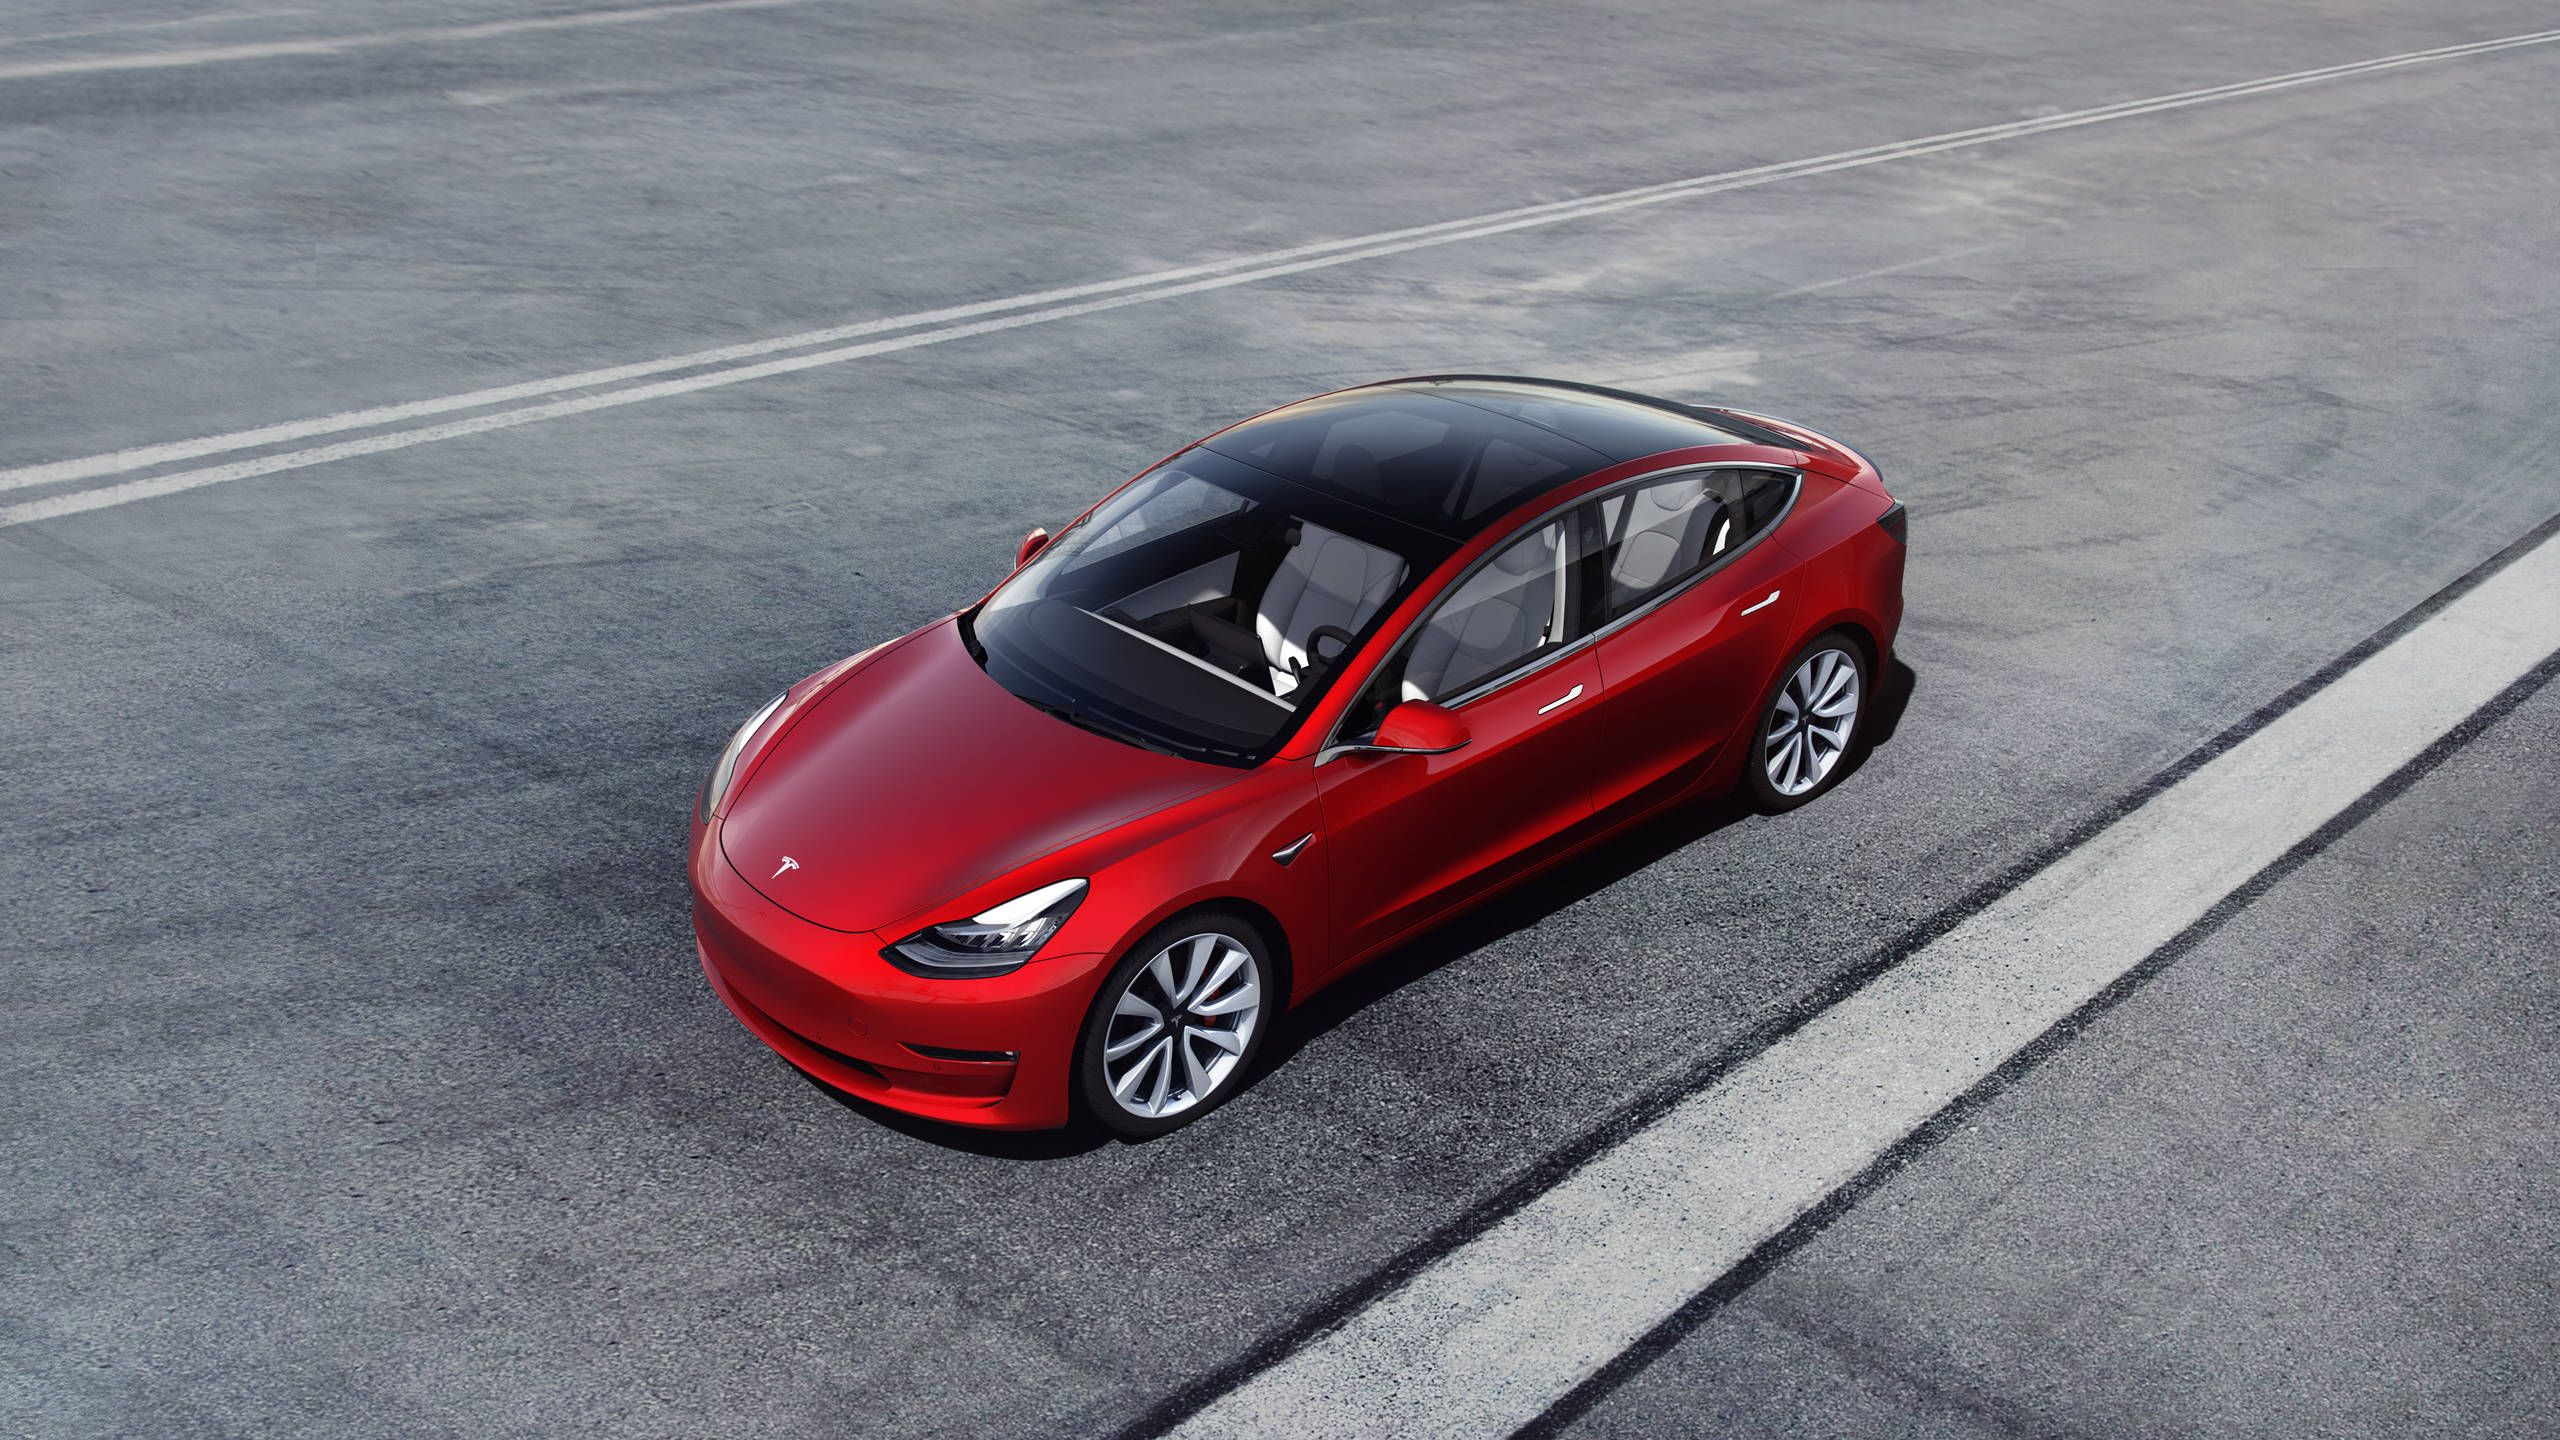 Tesla Model 3 Performance first drive: The best Tesla yet?